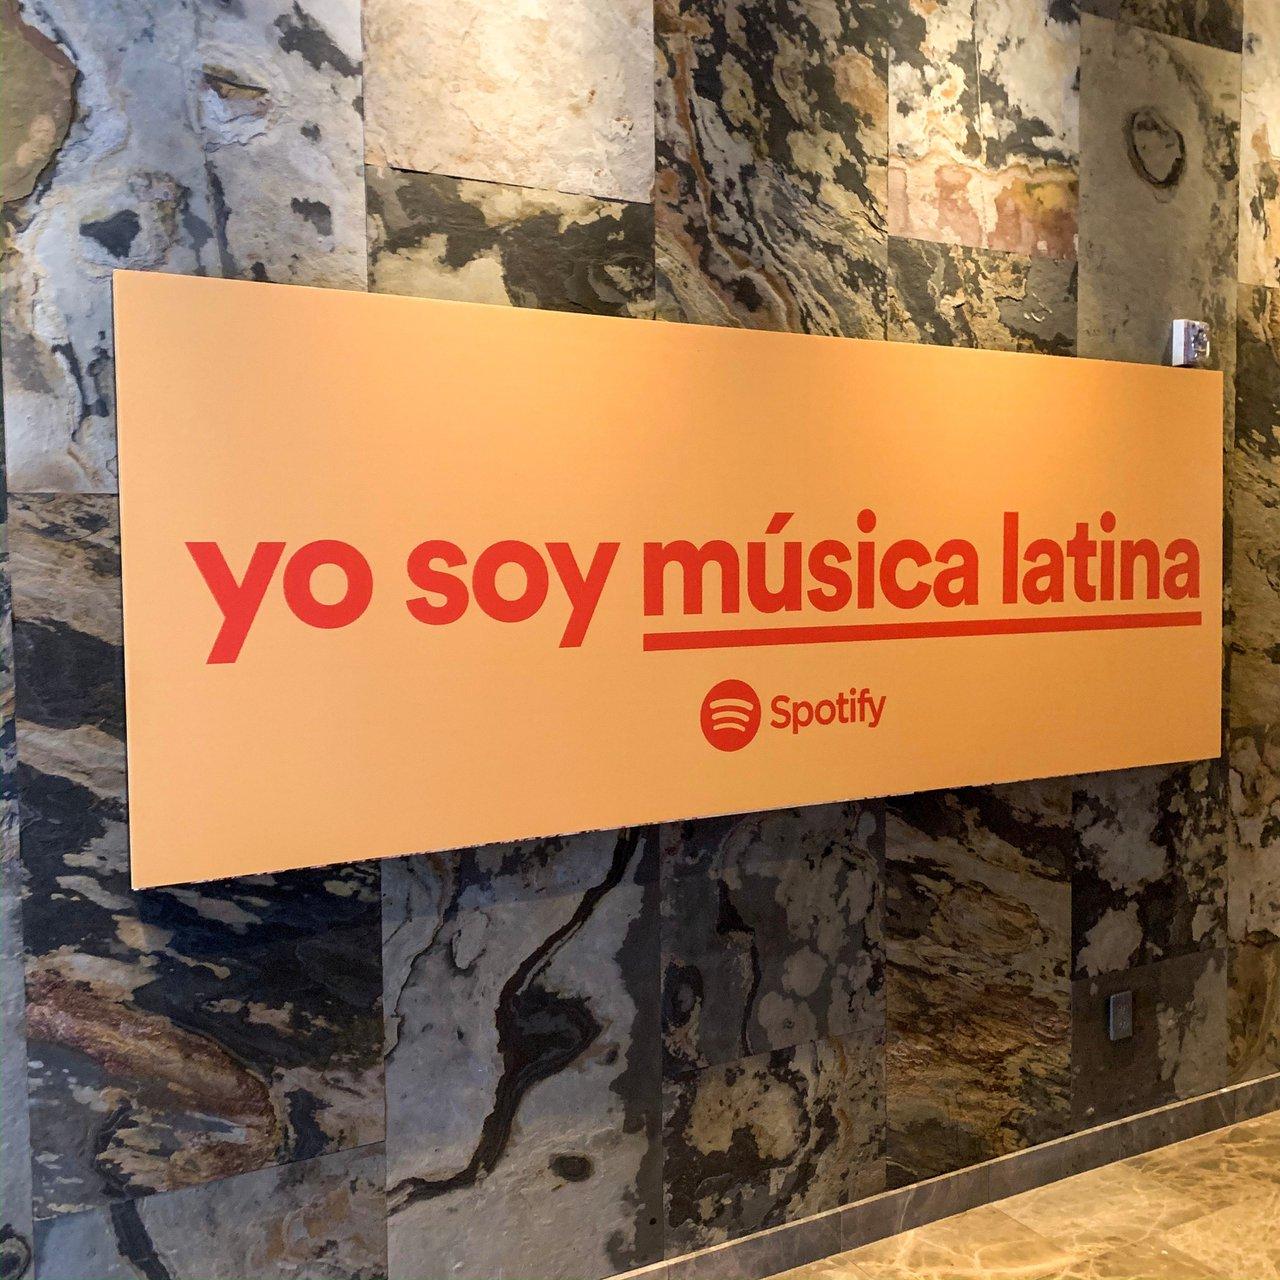 2019 Latin Grammys Spotify After Party photo Photo Nov 11, 1 24 08 PM.jpg